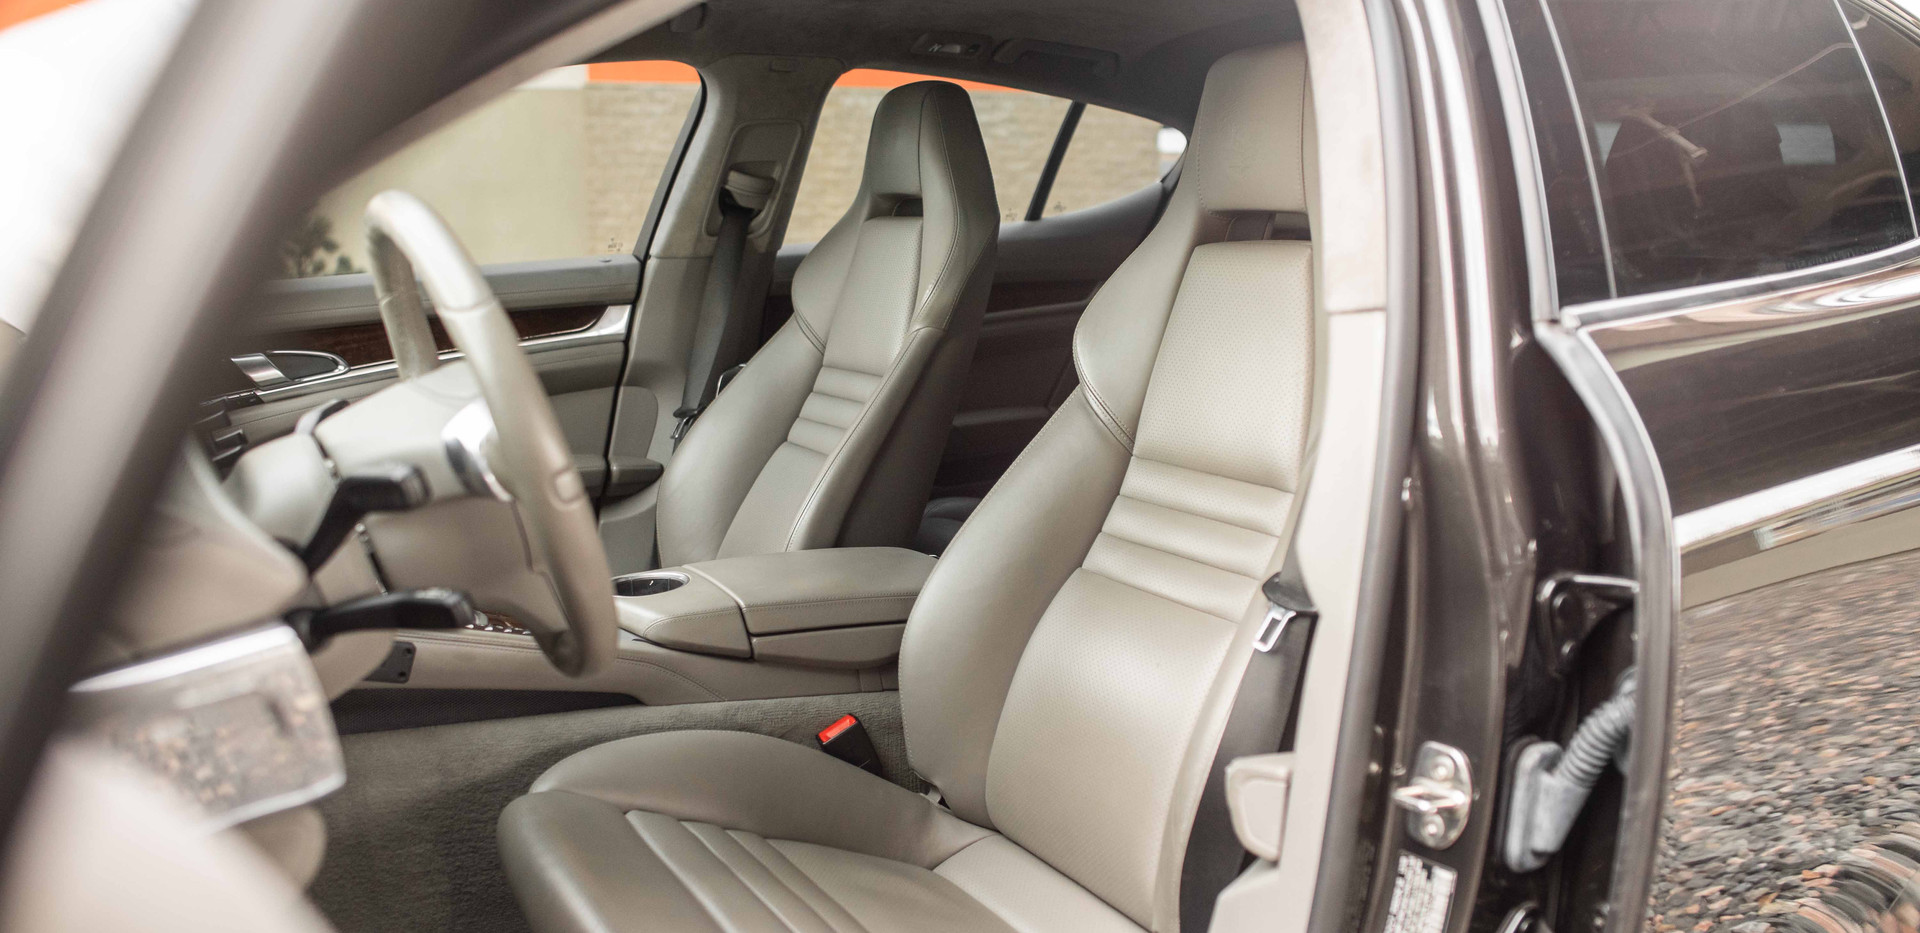 Interior_Front_Seats.jpg